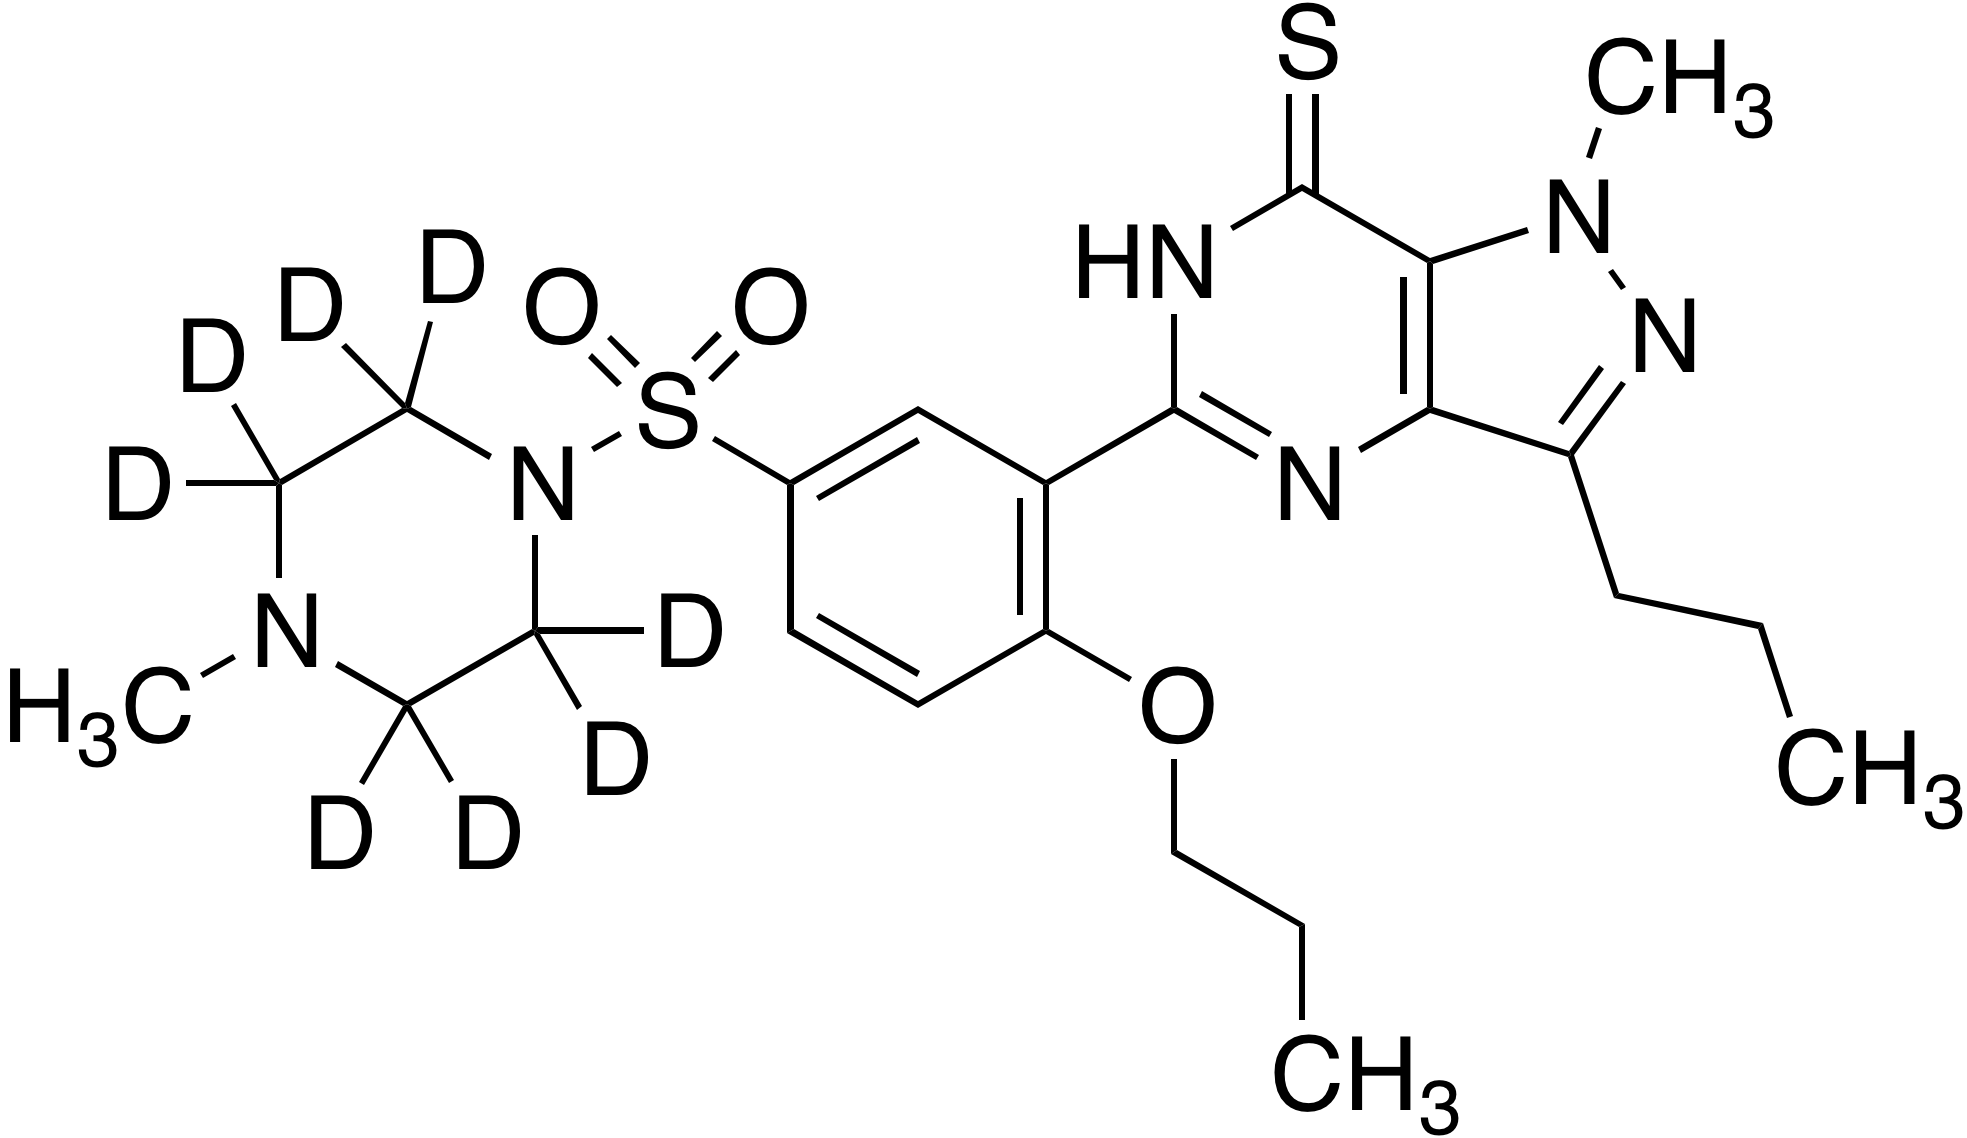 Propoxyphenyl thiosildenafil-d<sub>8</sub> (piperazine-d<sub>8</sub>)